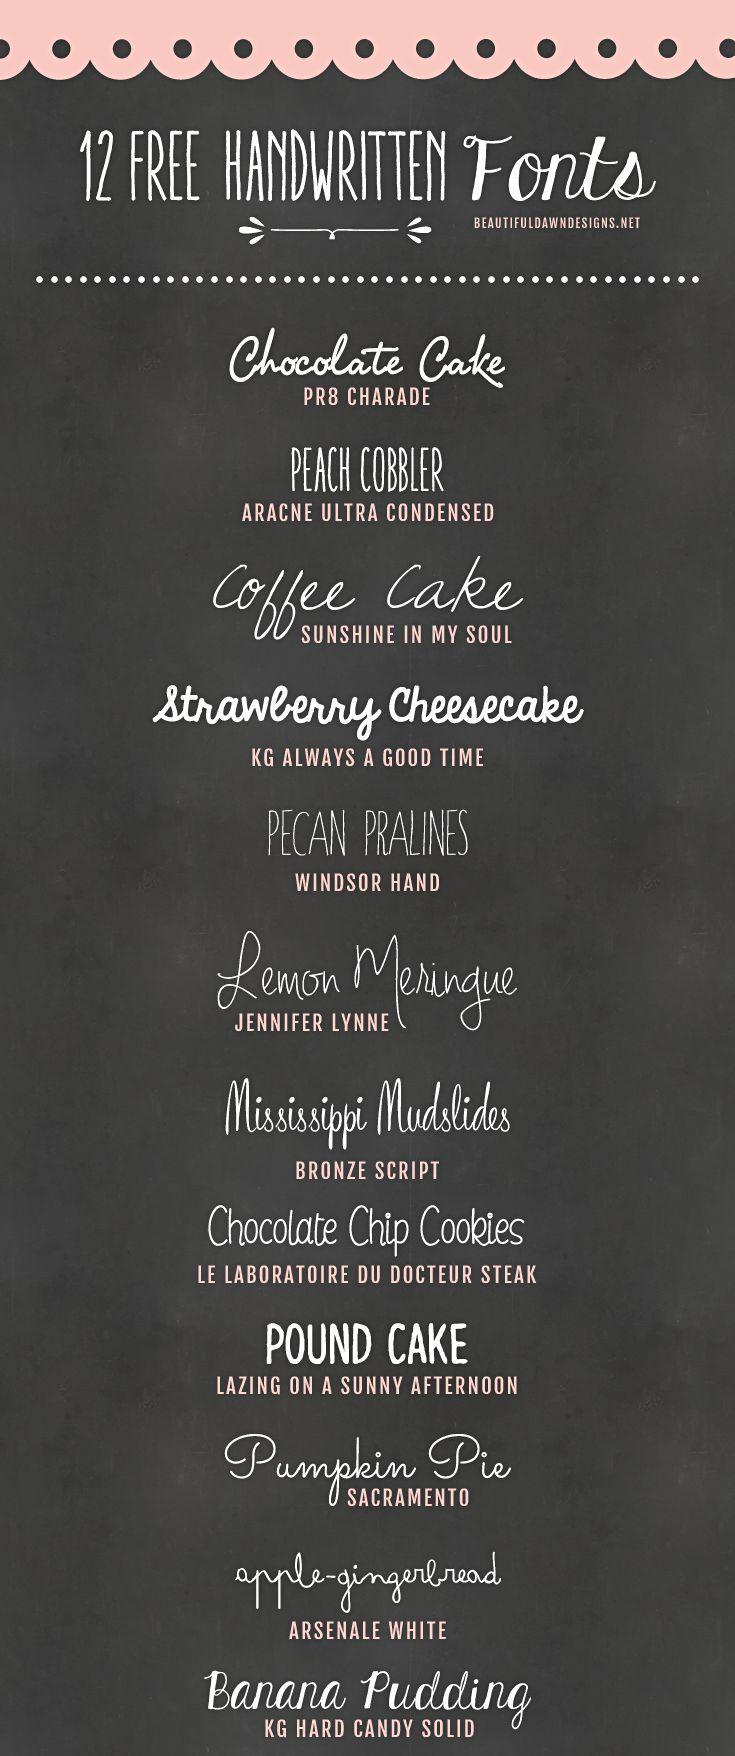 12 Free Handwritten Fonts @ Beautiful Dawn designs ~~ {w/ easy download links} ~~